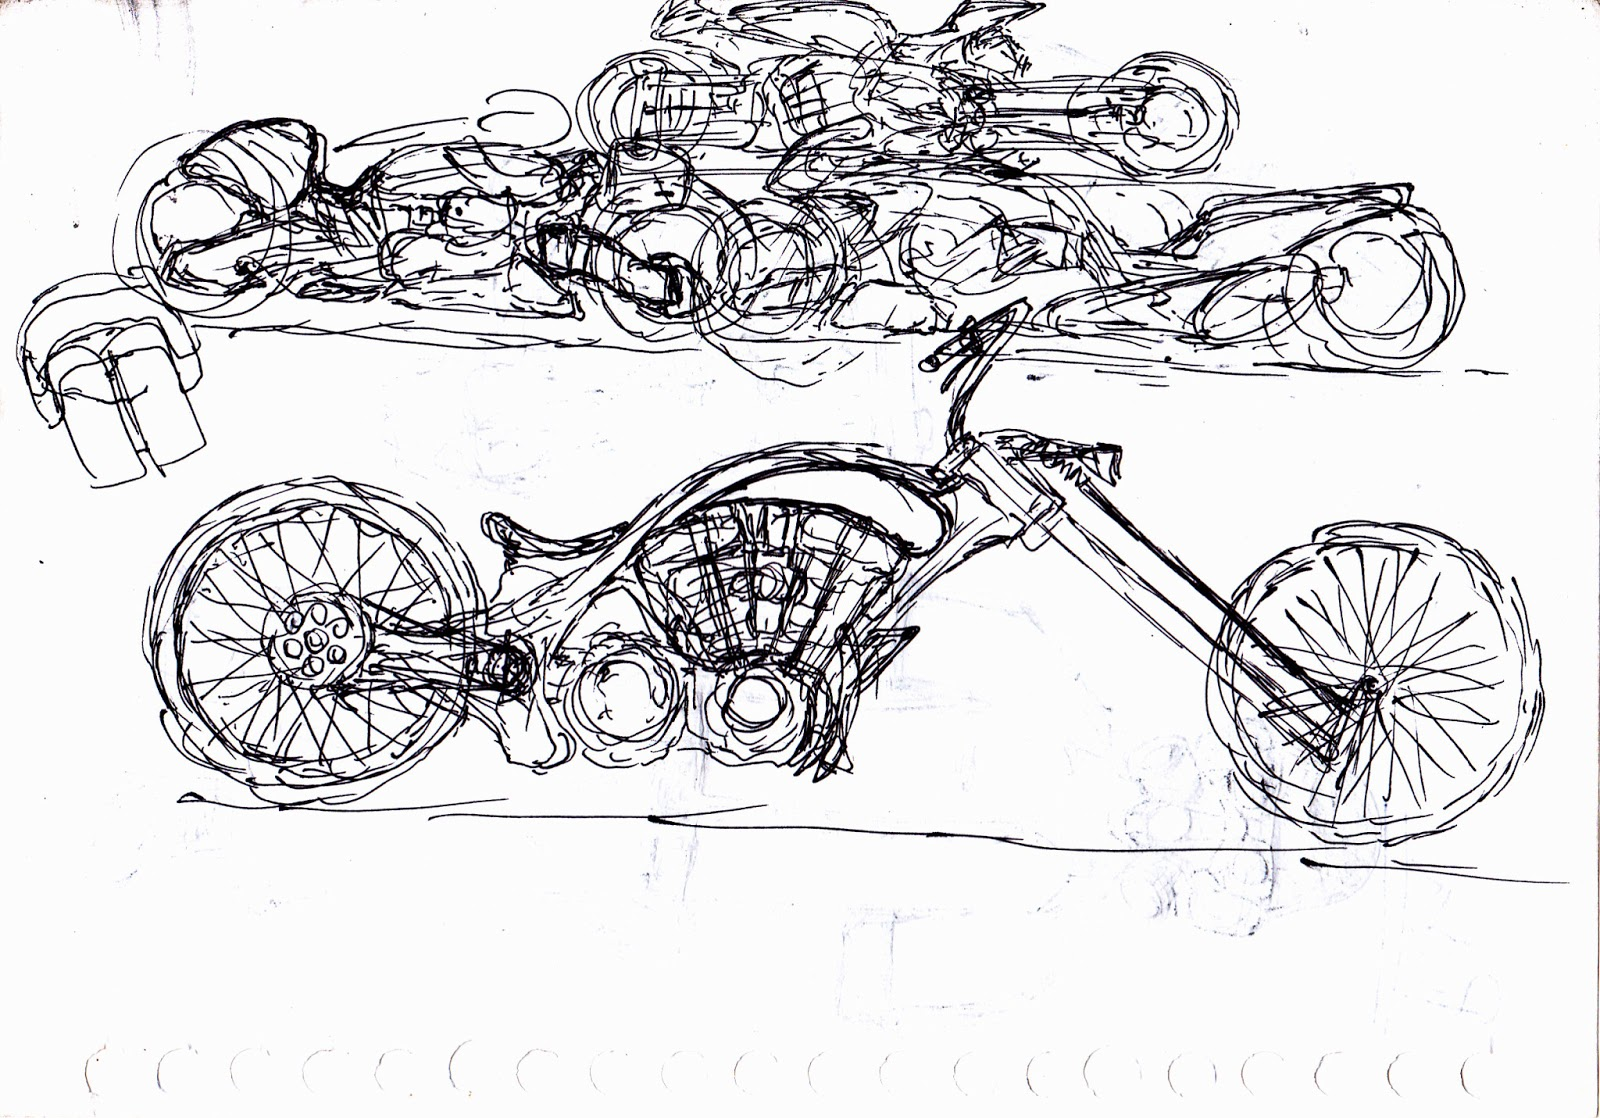 Motorcycle Sketch April